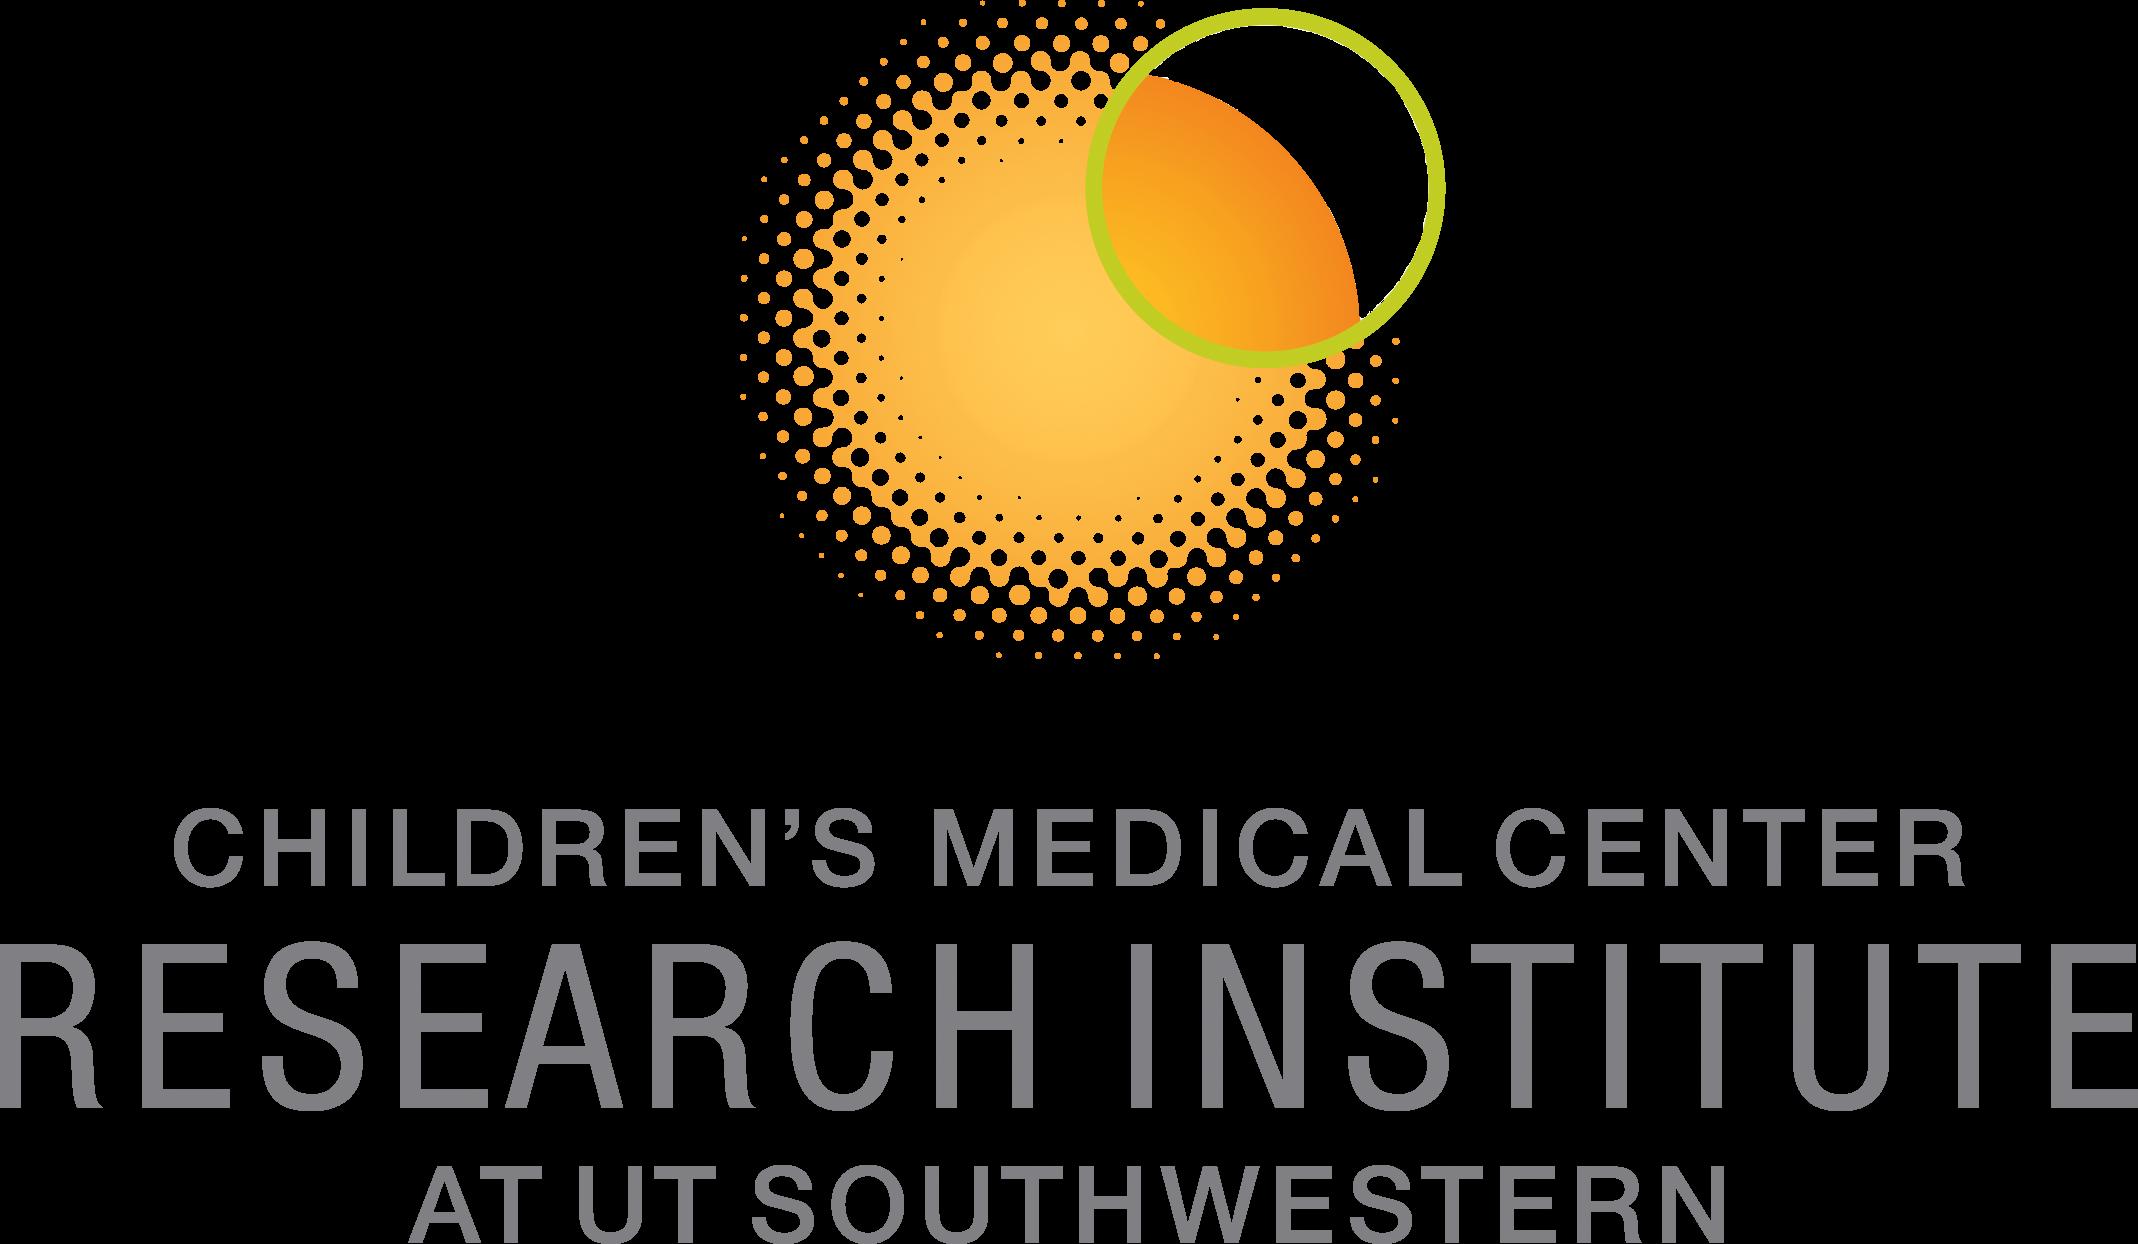 Children's Medical Center Research Institute at UTSW